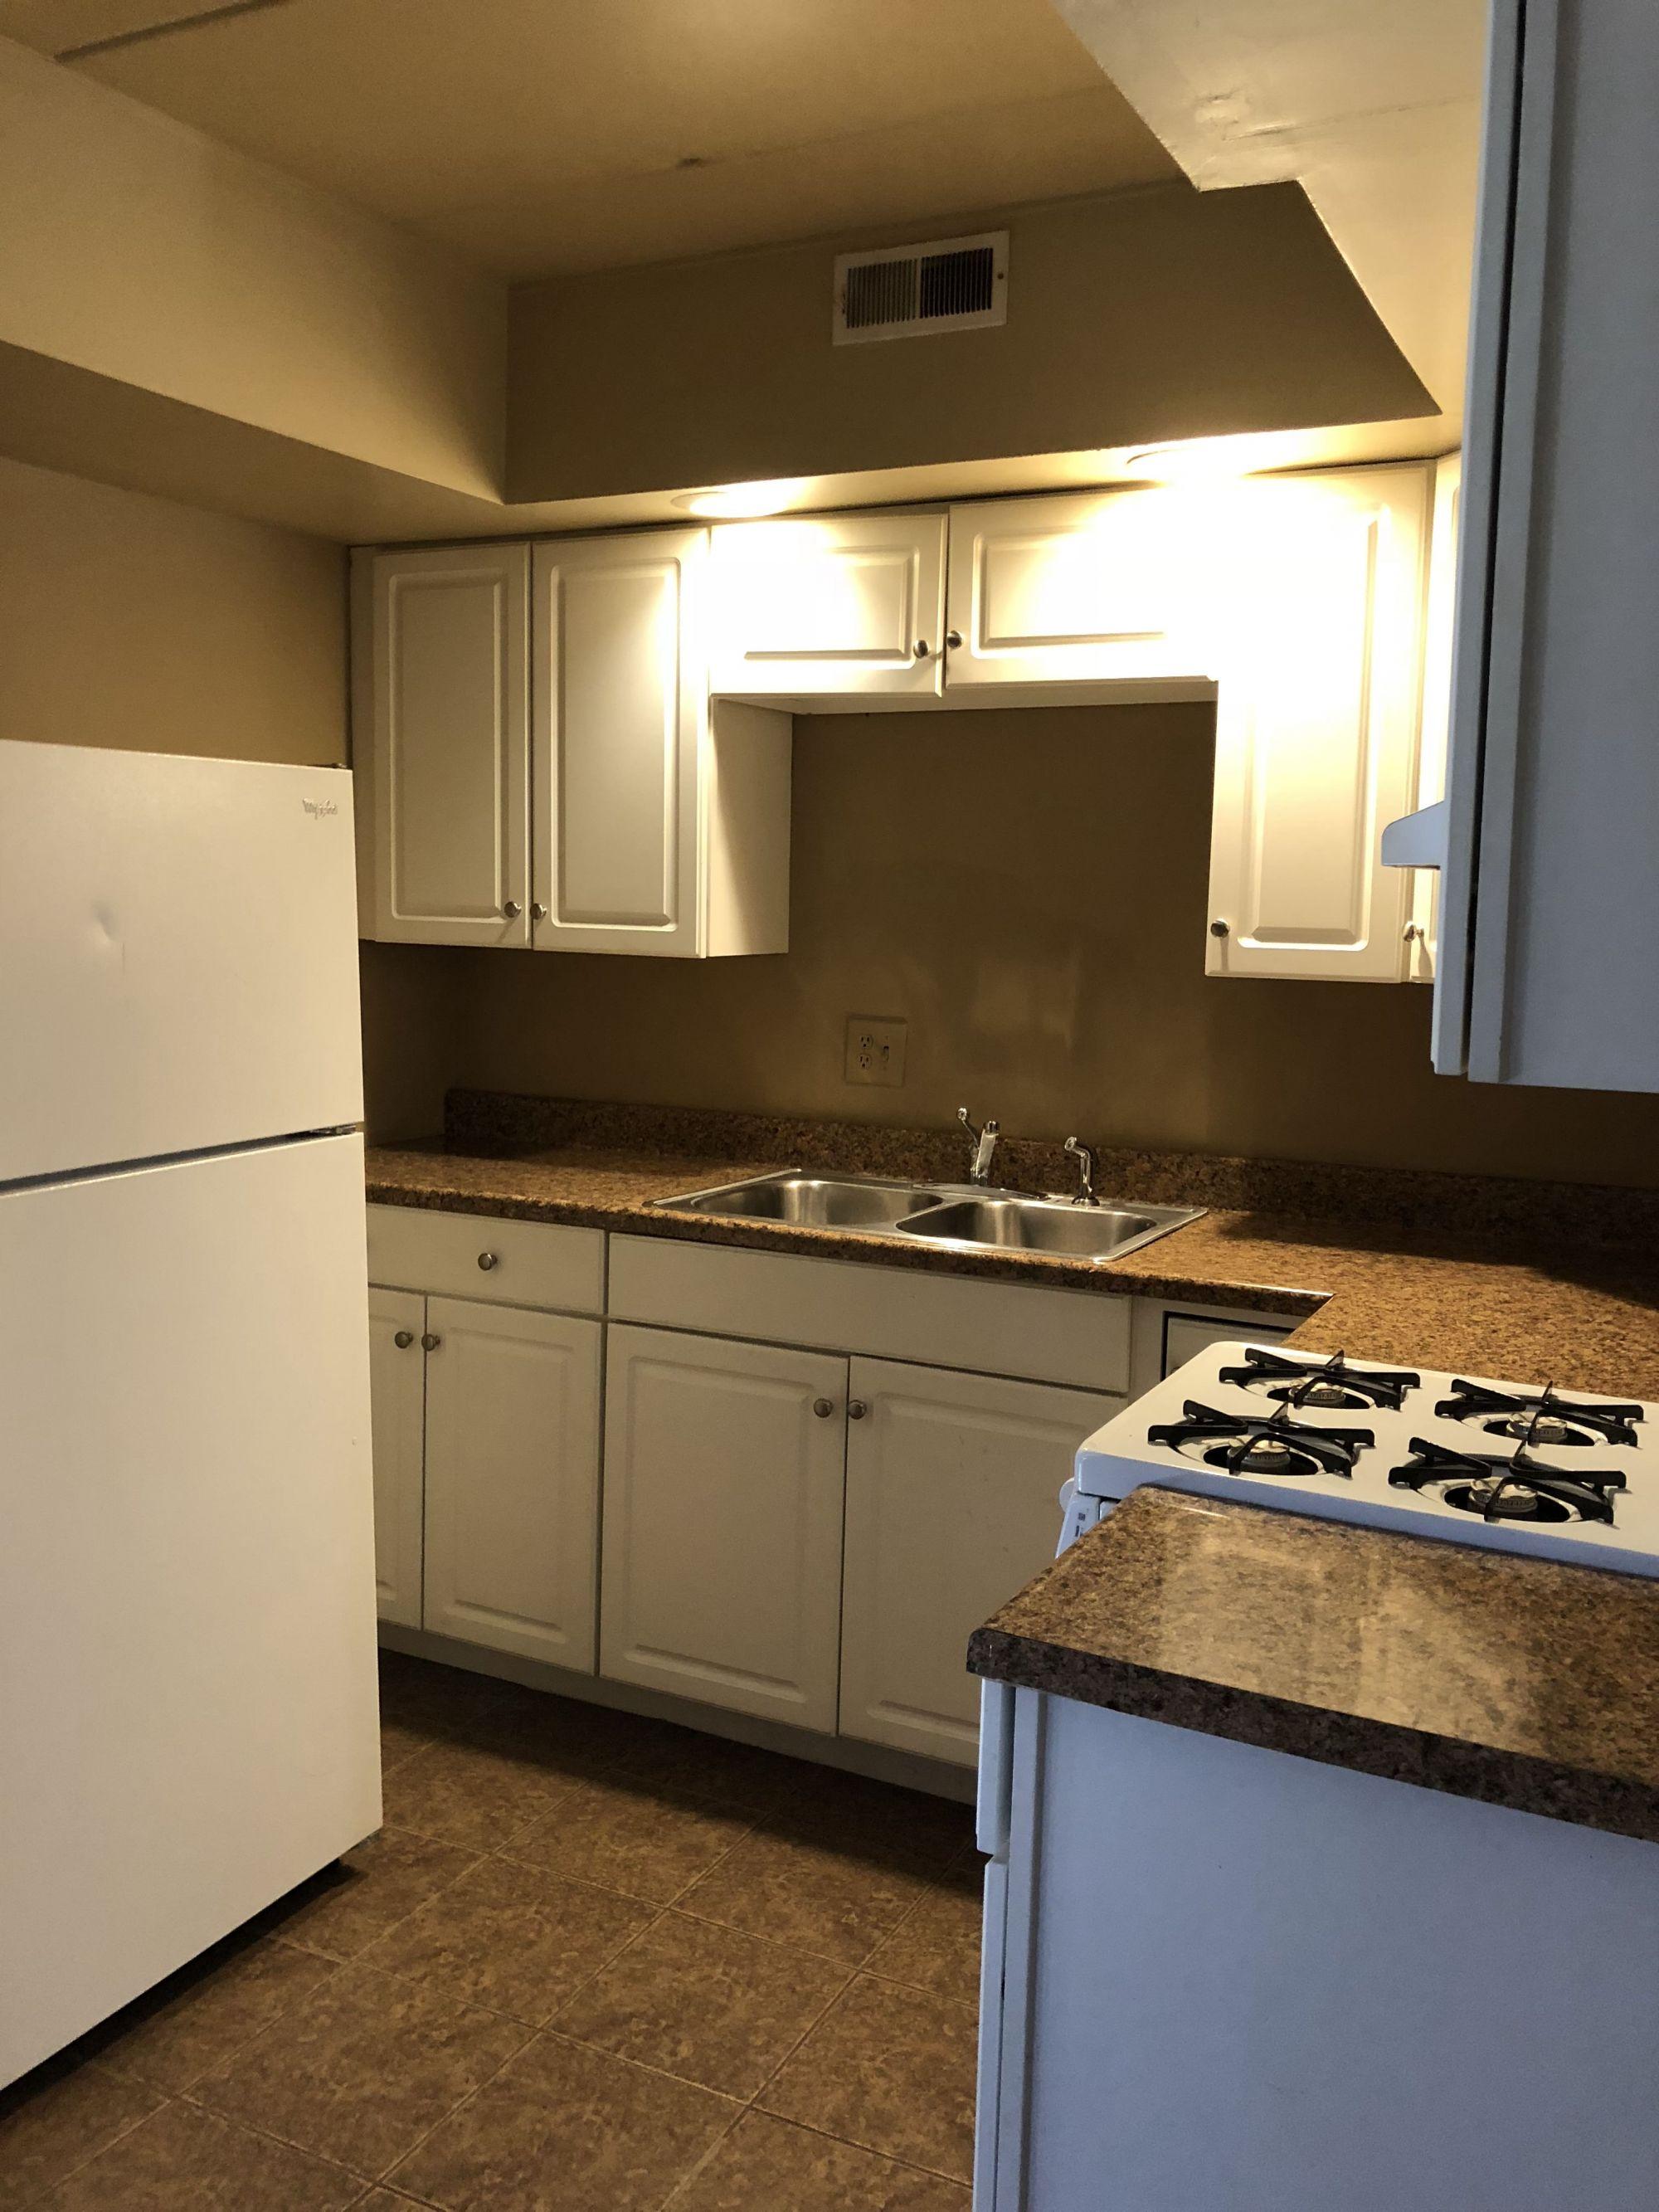 Apartments Near Champaign 407 S State for Champaign Students in Champaign, IL